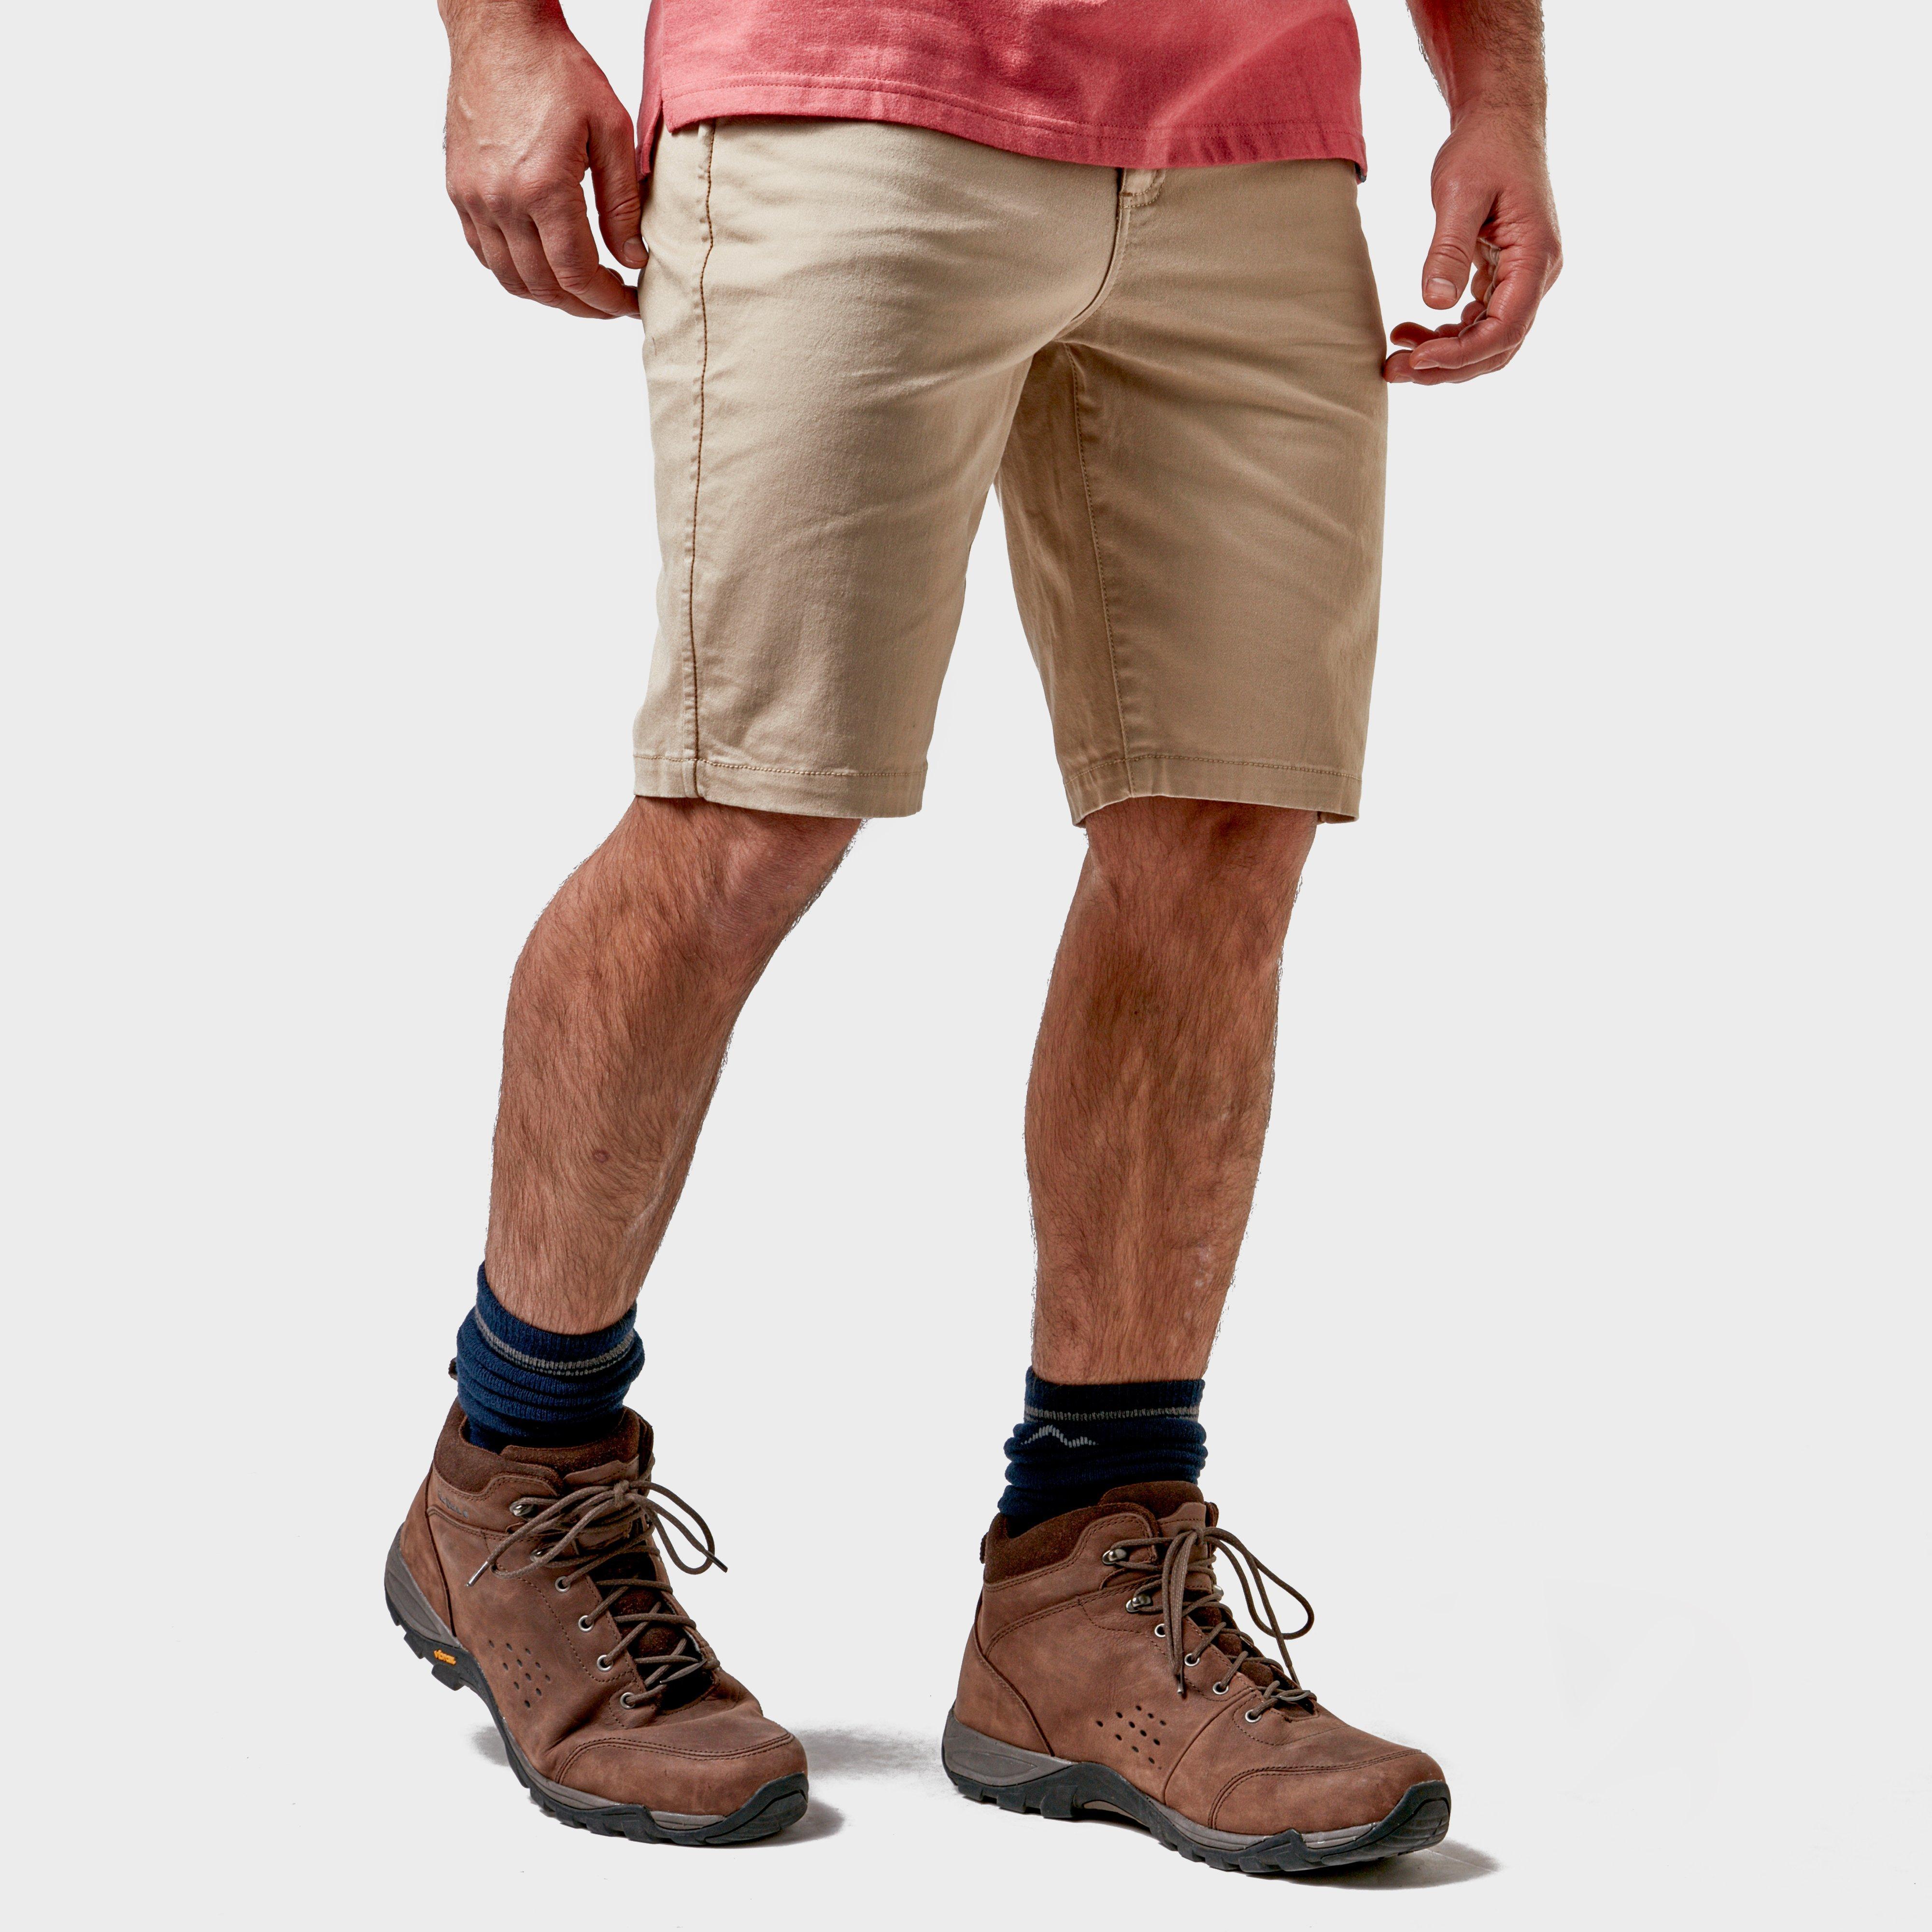 Regatta Regatta Mens Salvator Shorts - Beige, Beige